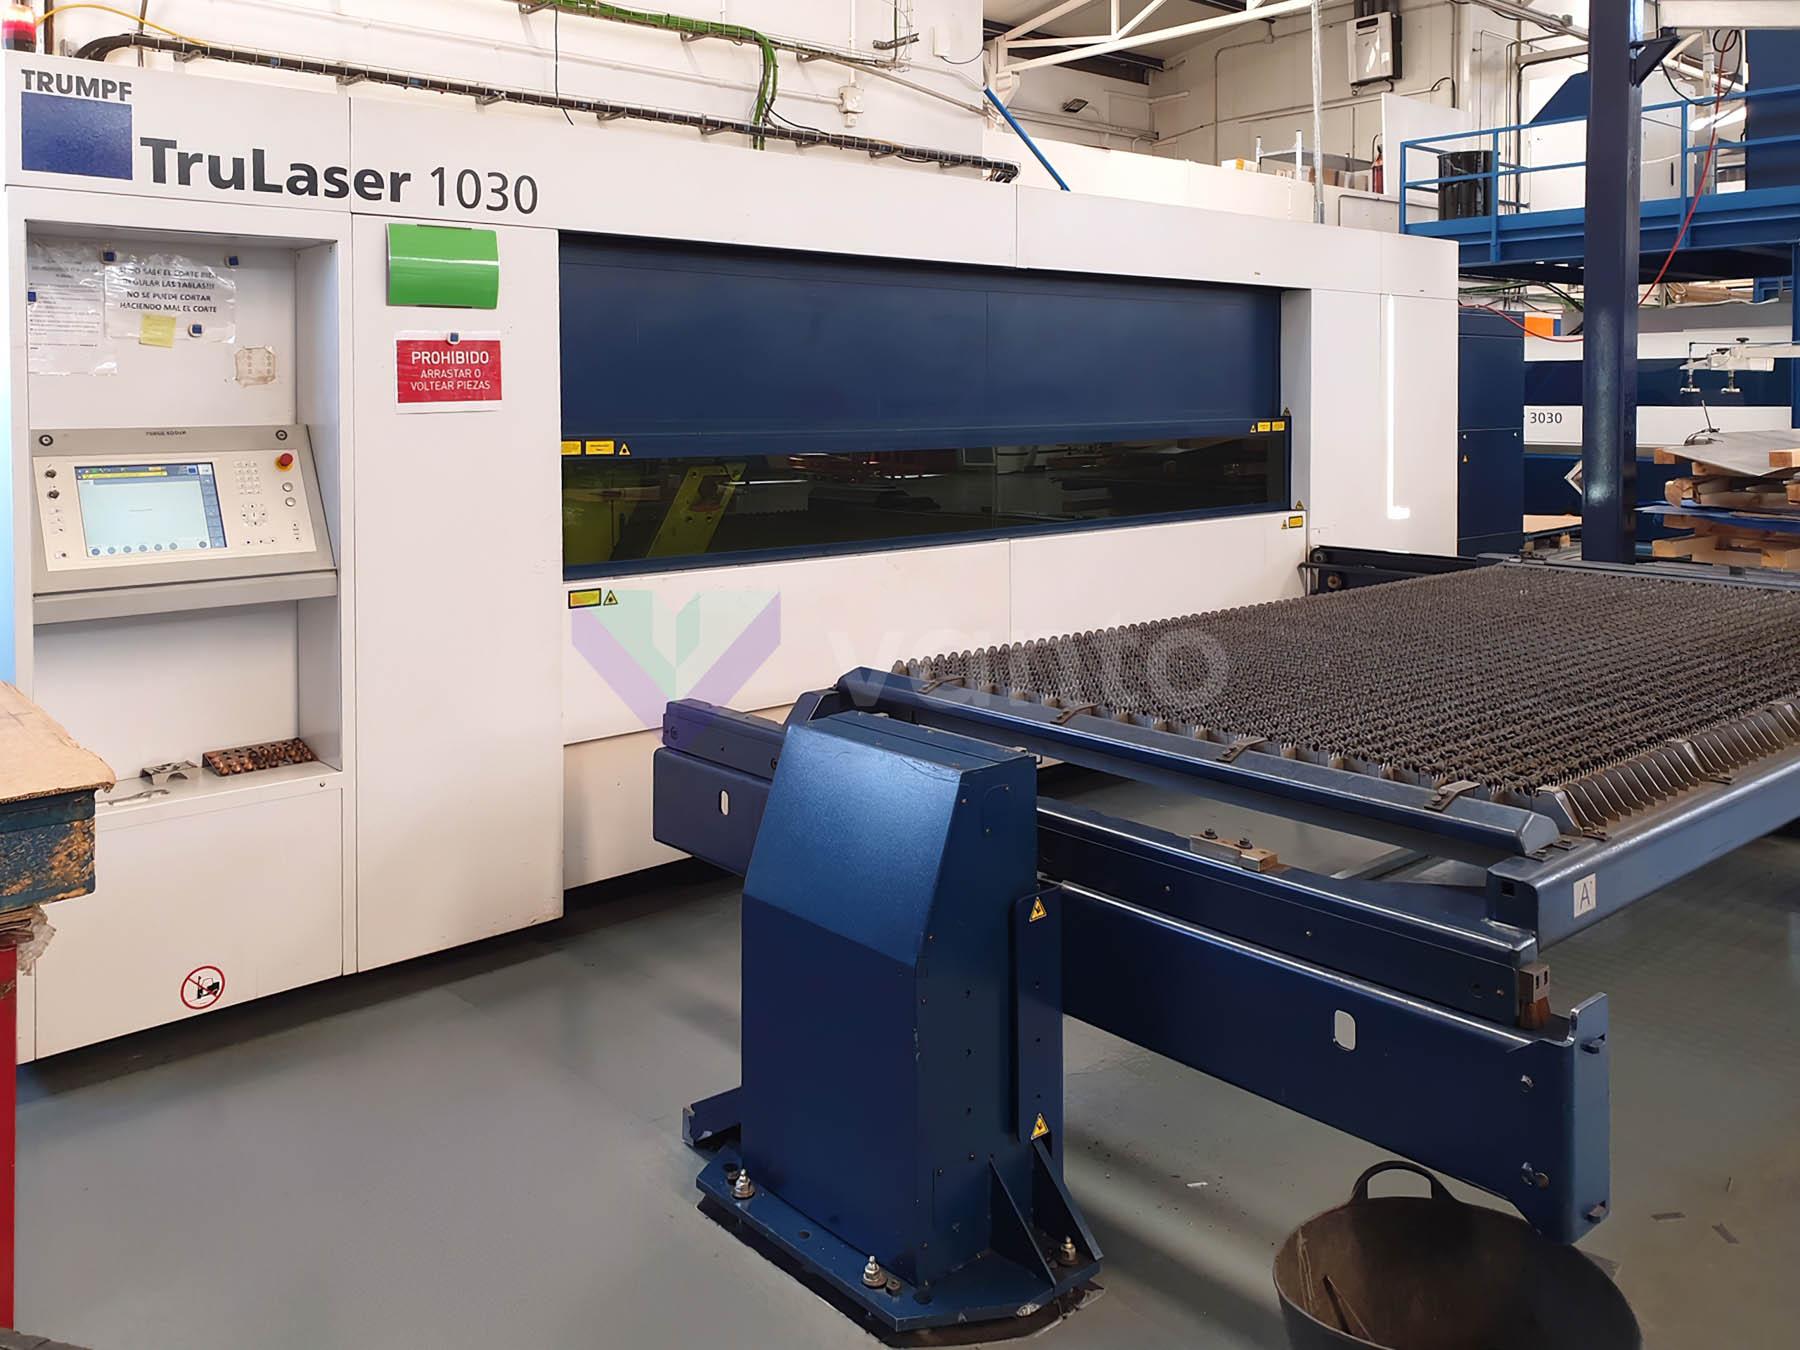 Máquina de corte láser (Fibra) TRUMPF TruLaser 1030 fiber (2014) id10392